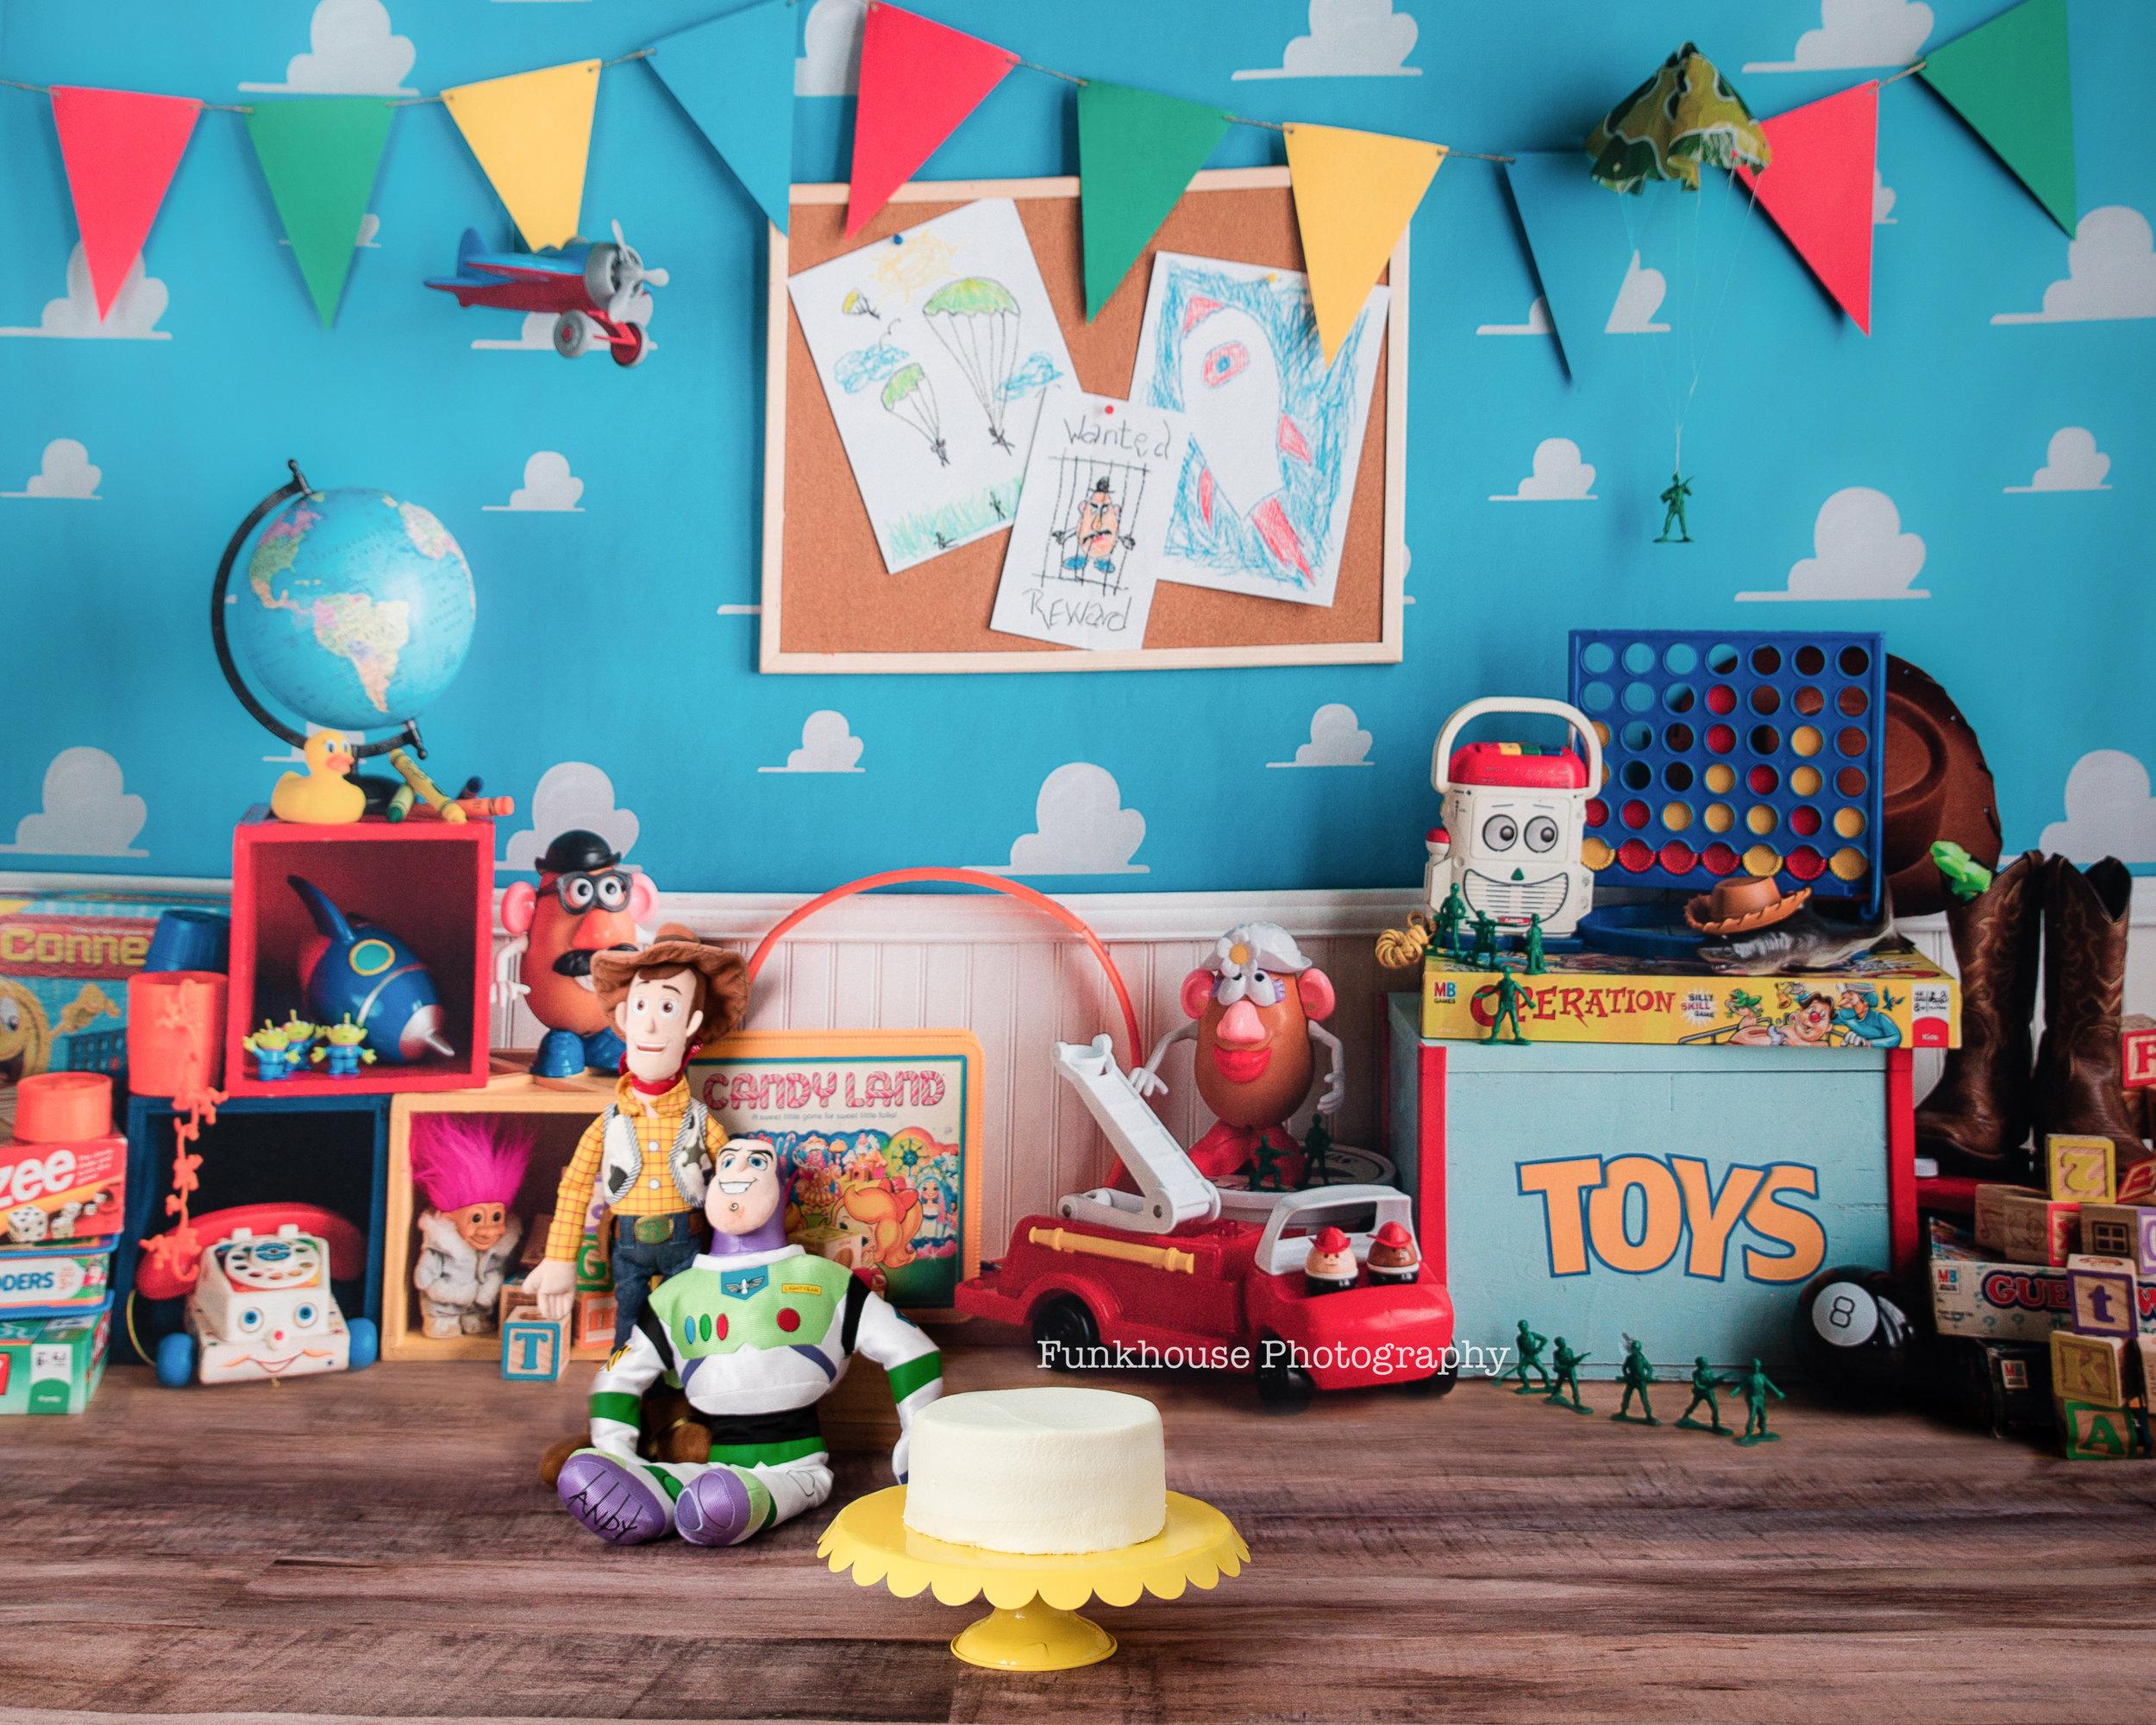 toy story cake fb.jpg